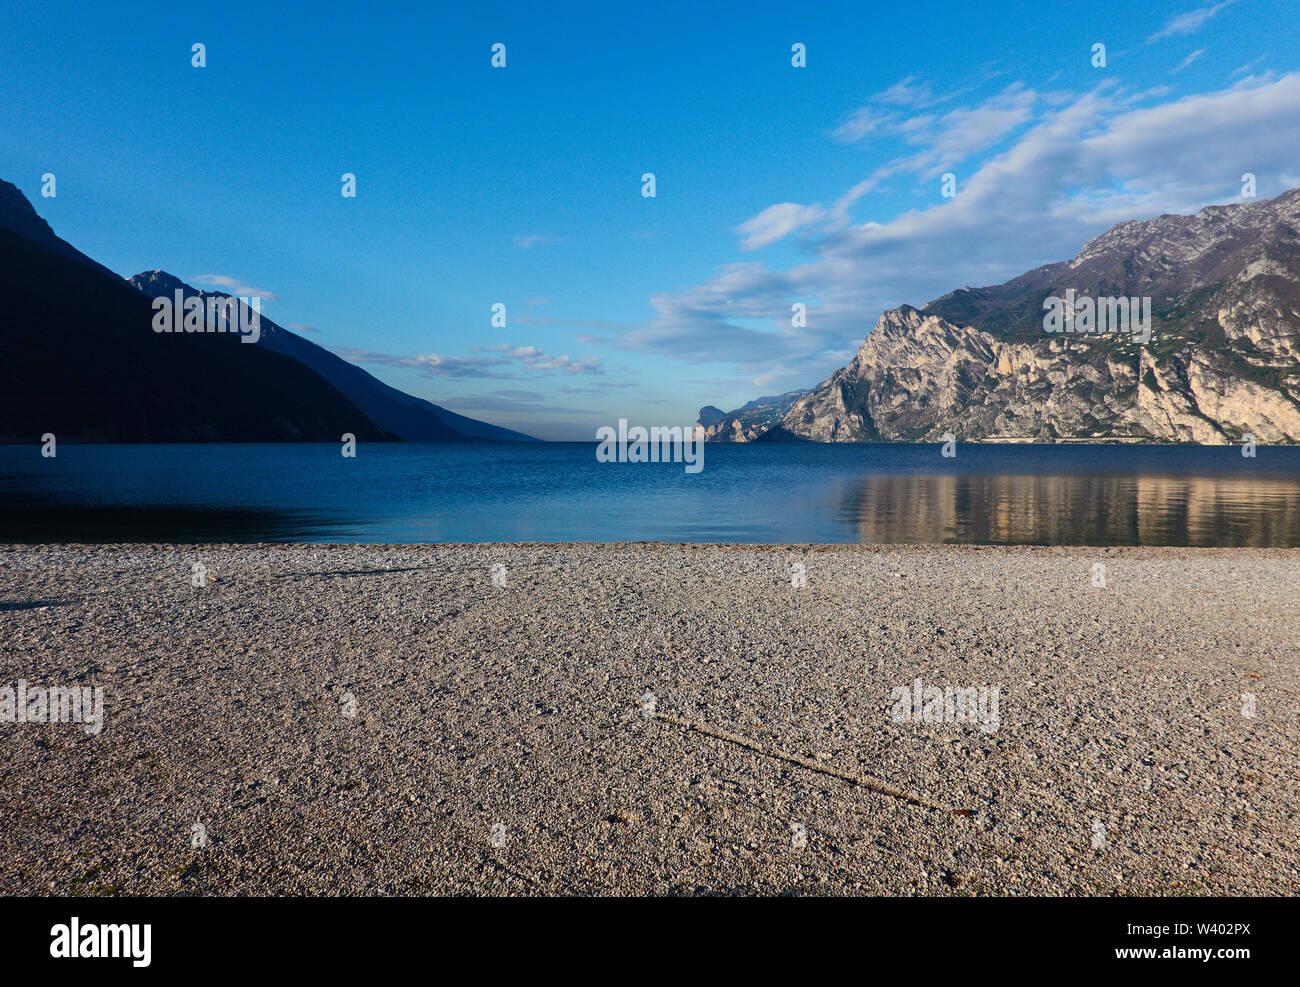 North beach on sunrise at Lago di Garda, Lake Garda in Torbole - Nago, Riva, Trentino , Italy at April 15, 2019. © Peter Schatz / Alamy Stock Photos - Stock Image